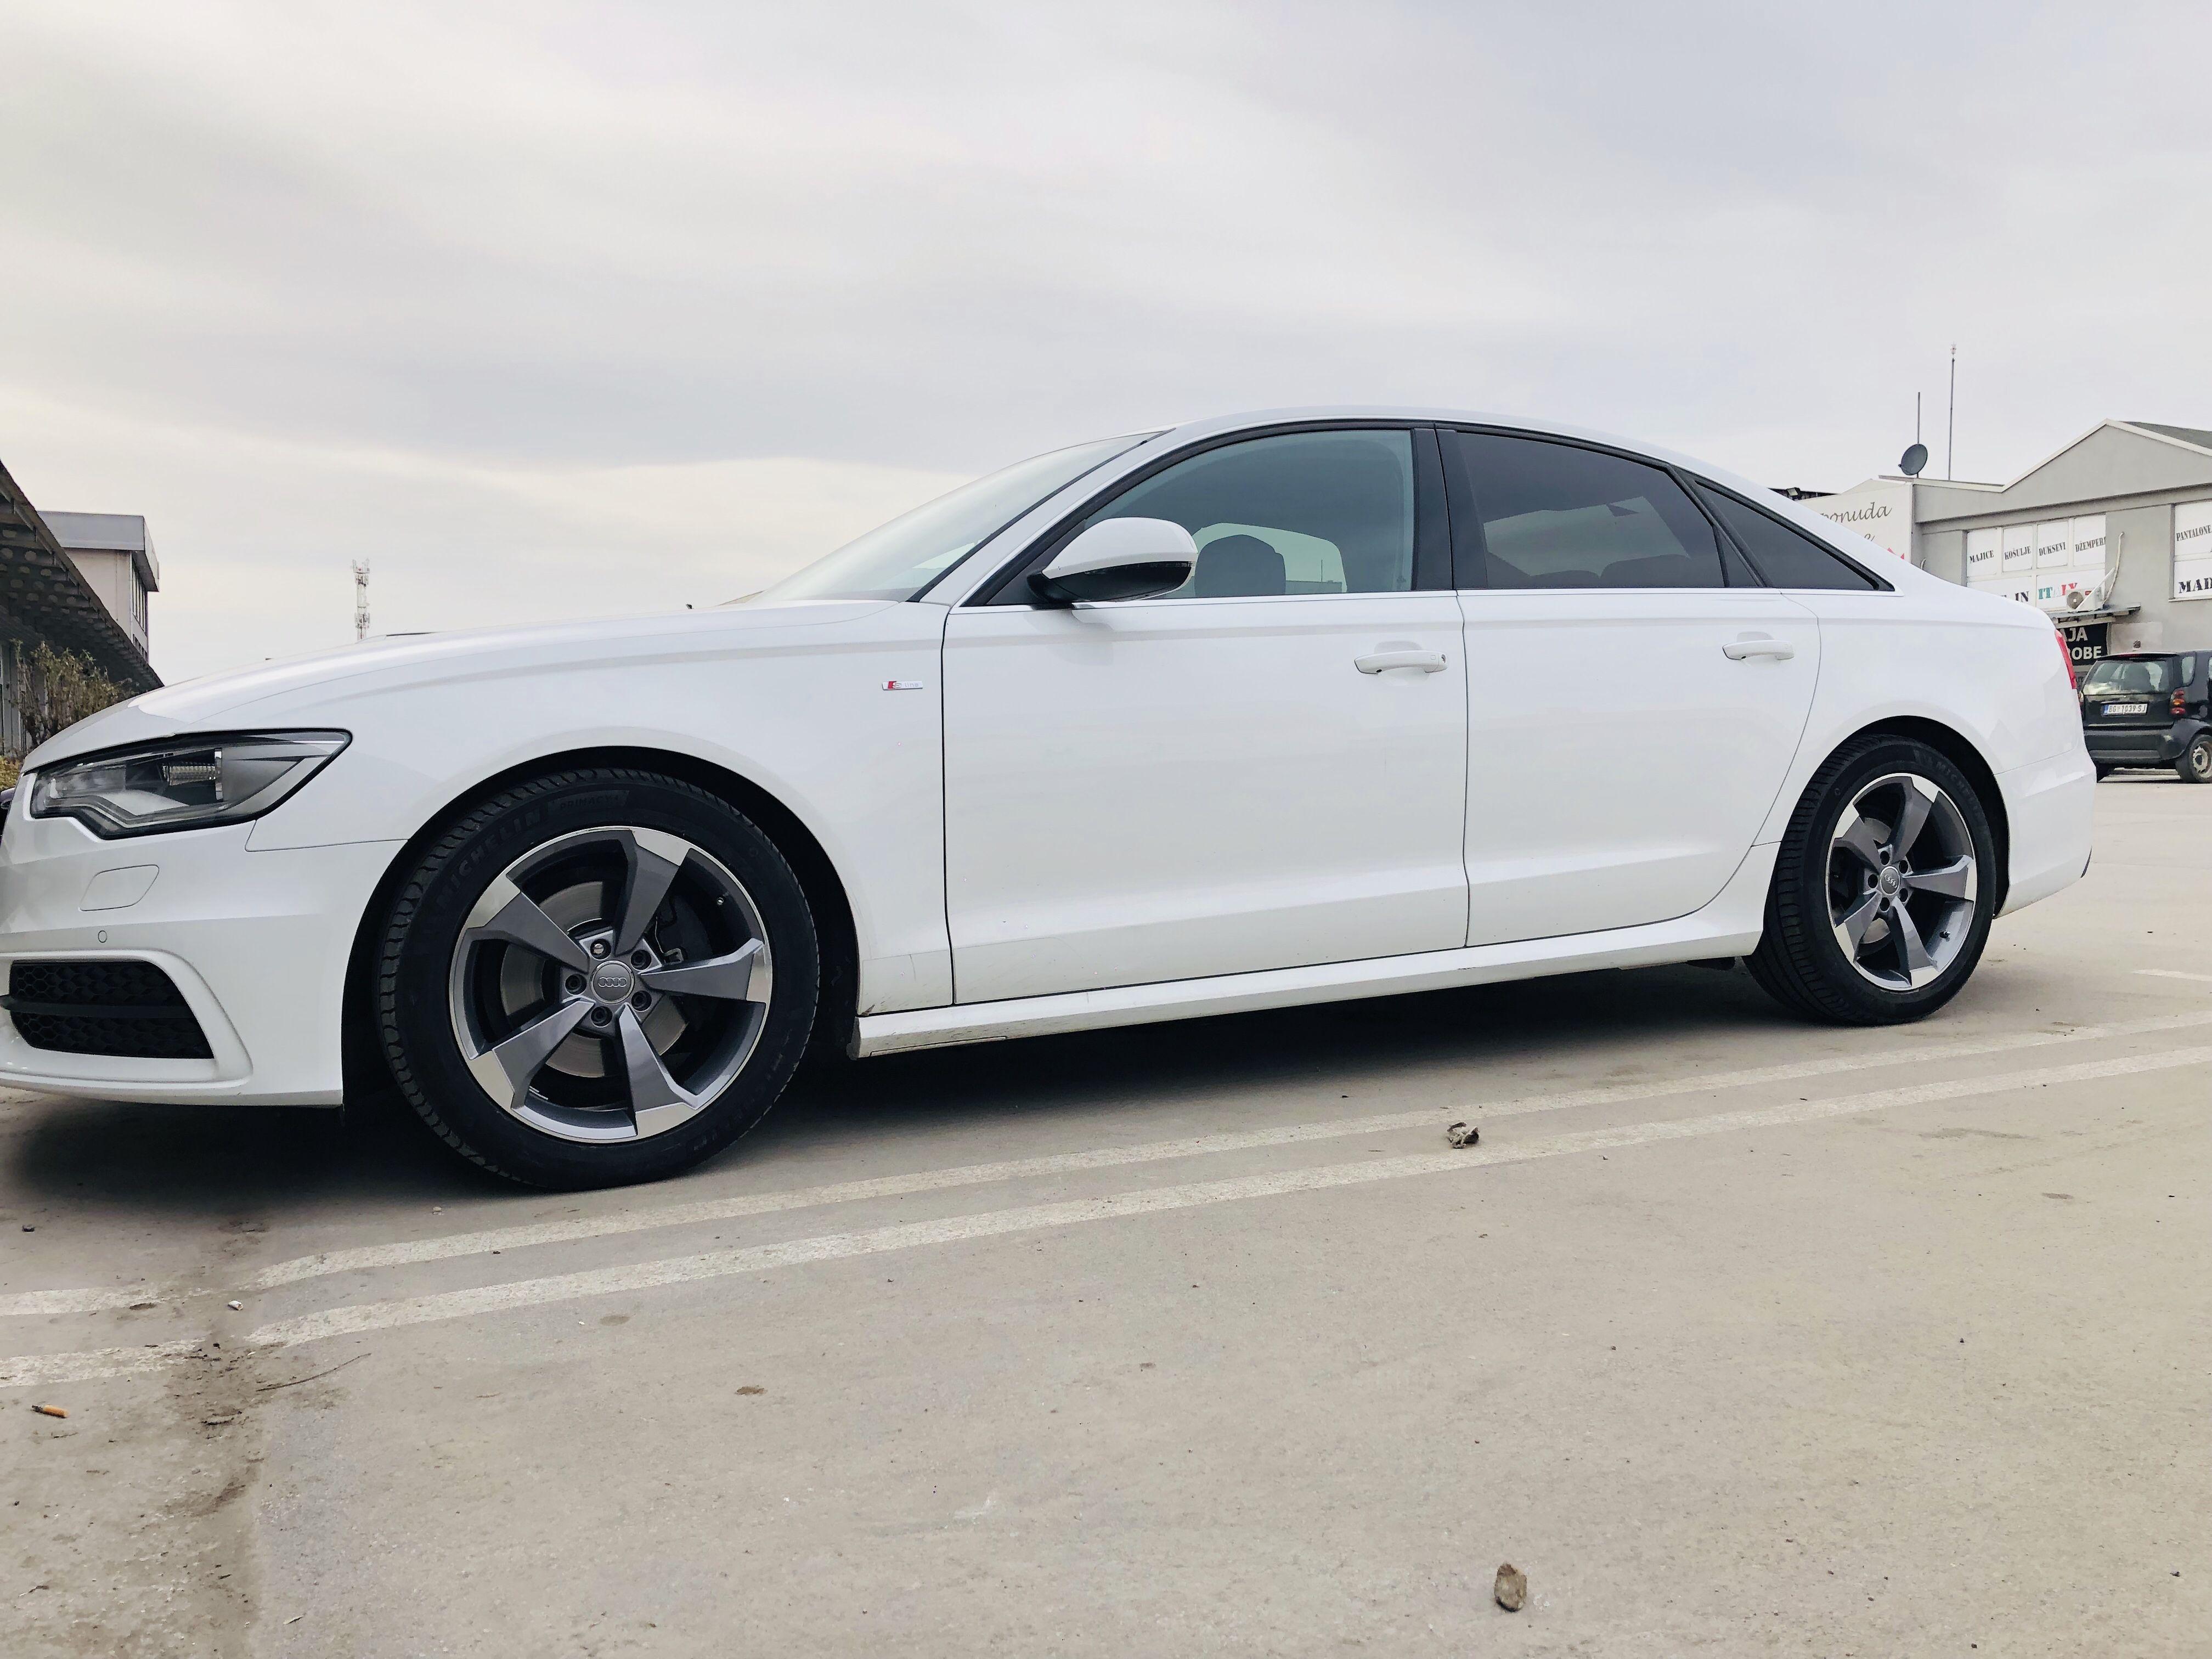 datum izdavanja naručivanje putem interneta nema poreza na promet Pin by Barokanac on Audi S line   Audi, Bmw, Vehicles